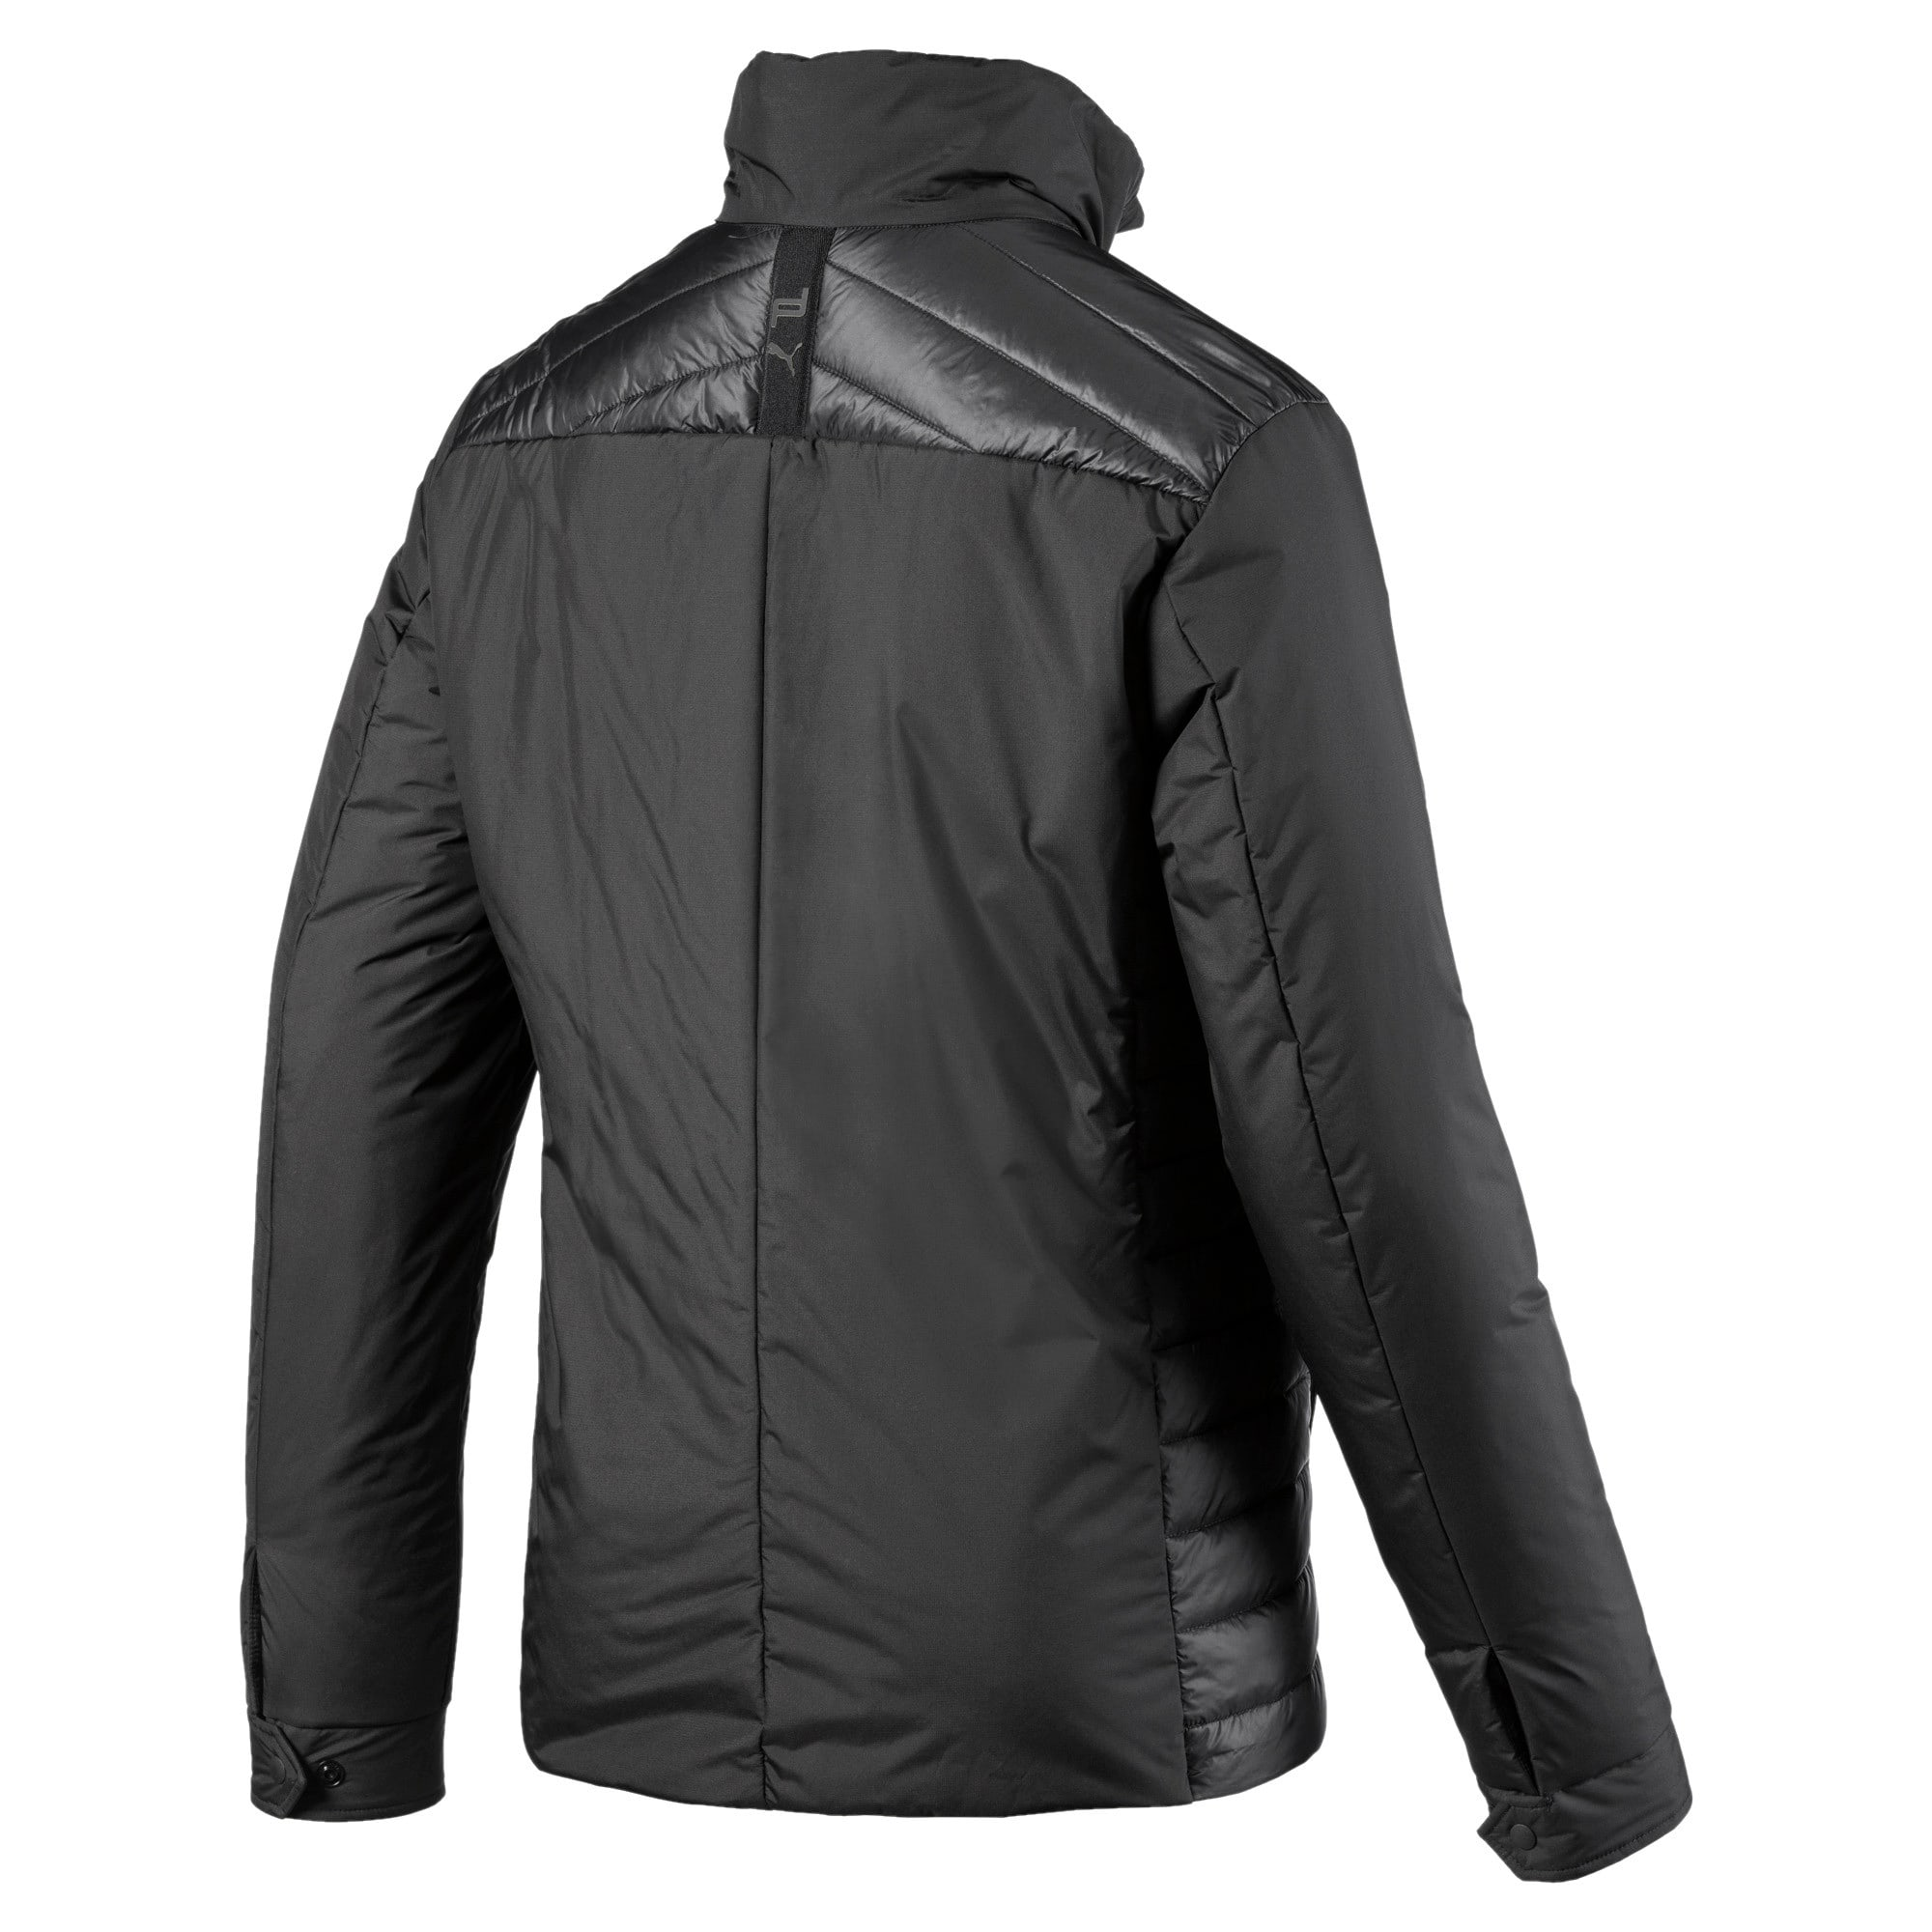 Thumbnail 2 of Porsche Design Men's Racing Jacket, Jet Black, medium